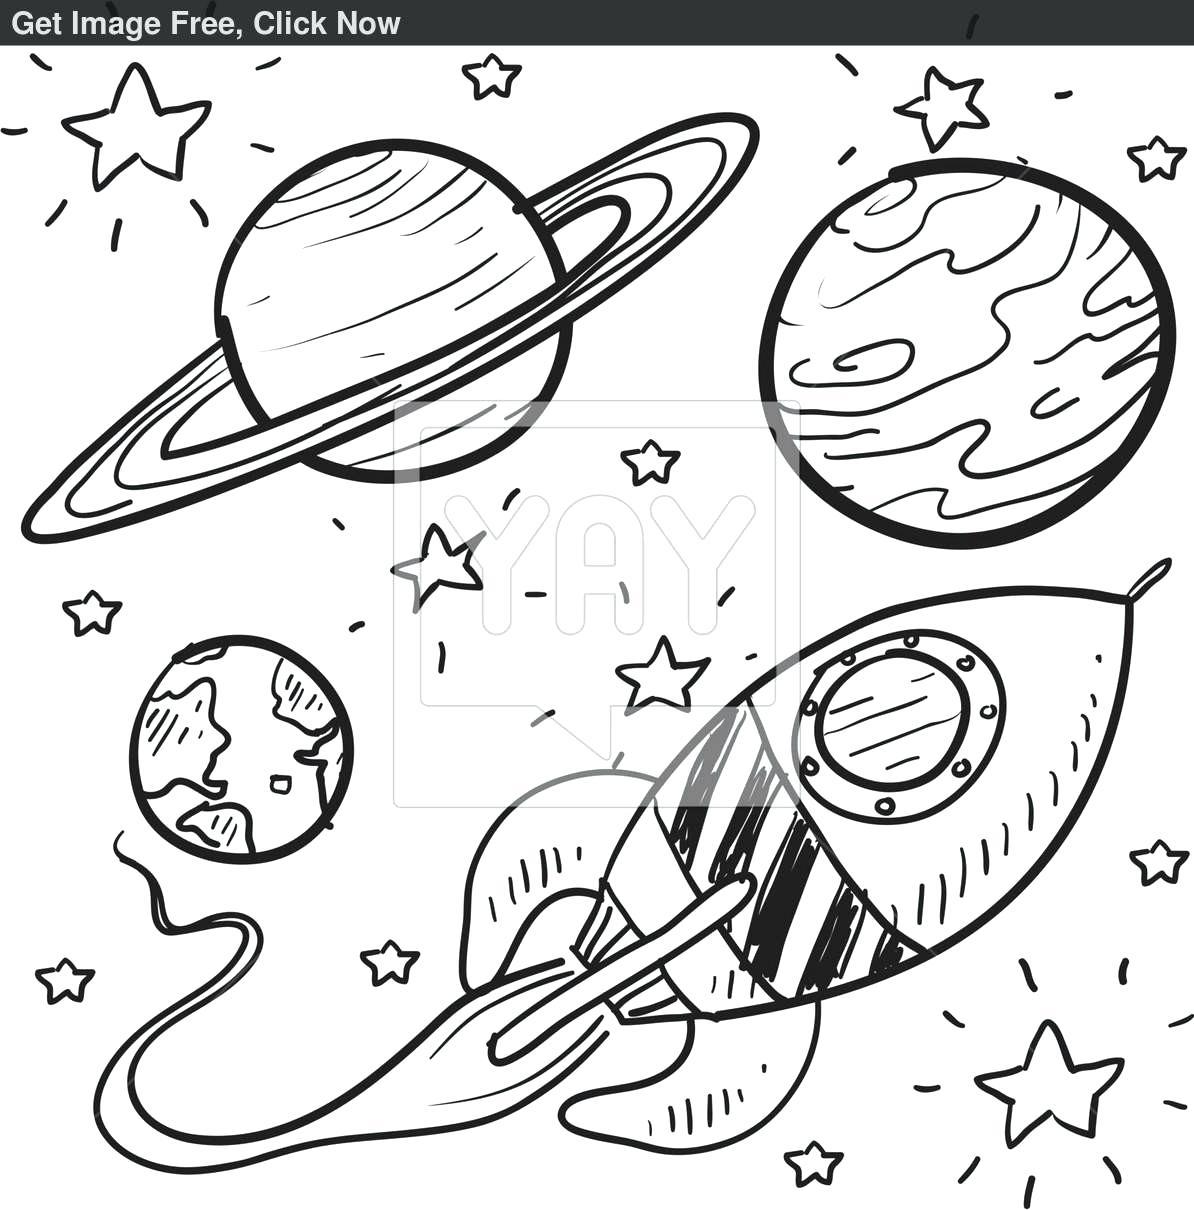 1194x1210 Coloring Rocket Ship Coloring Page